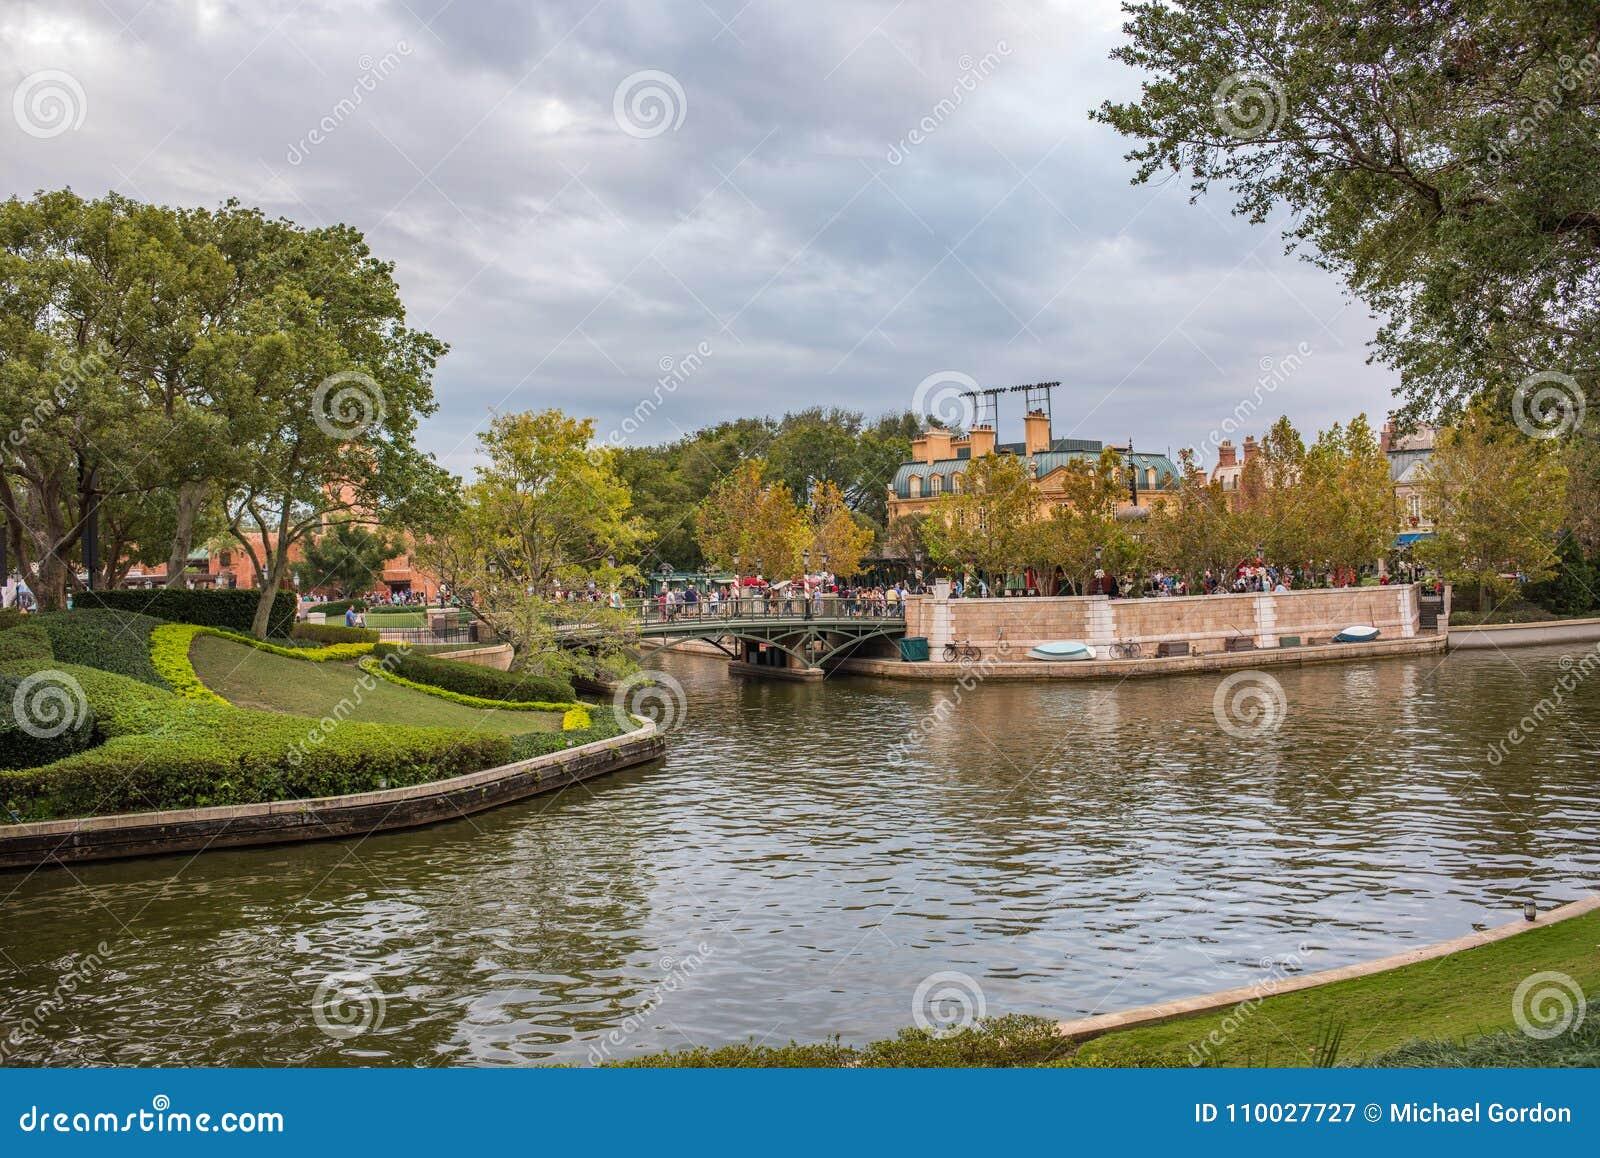 Epcot in Walt Disney World